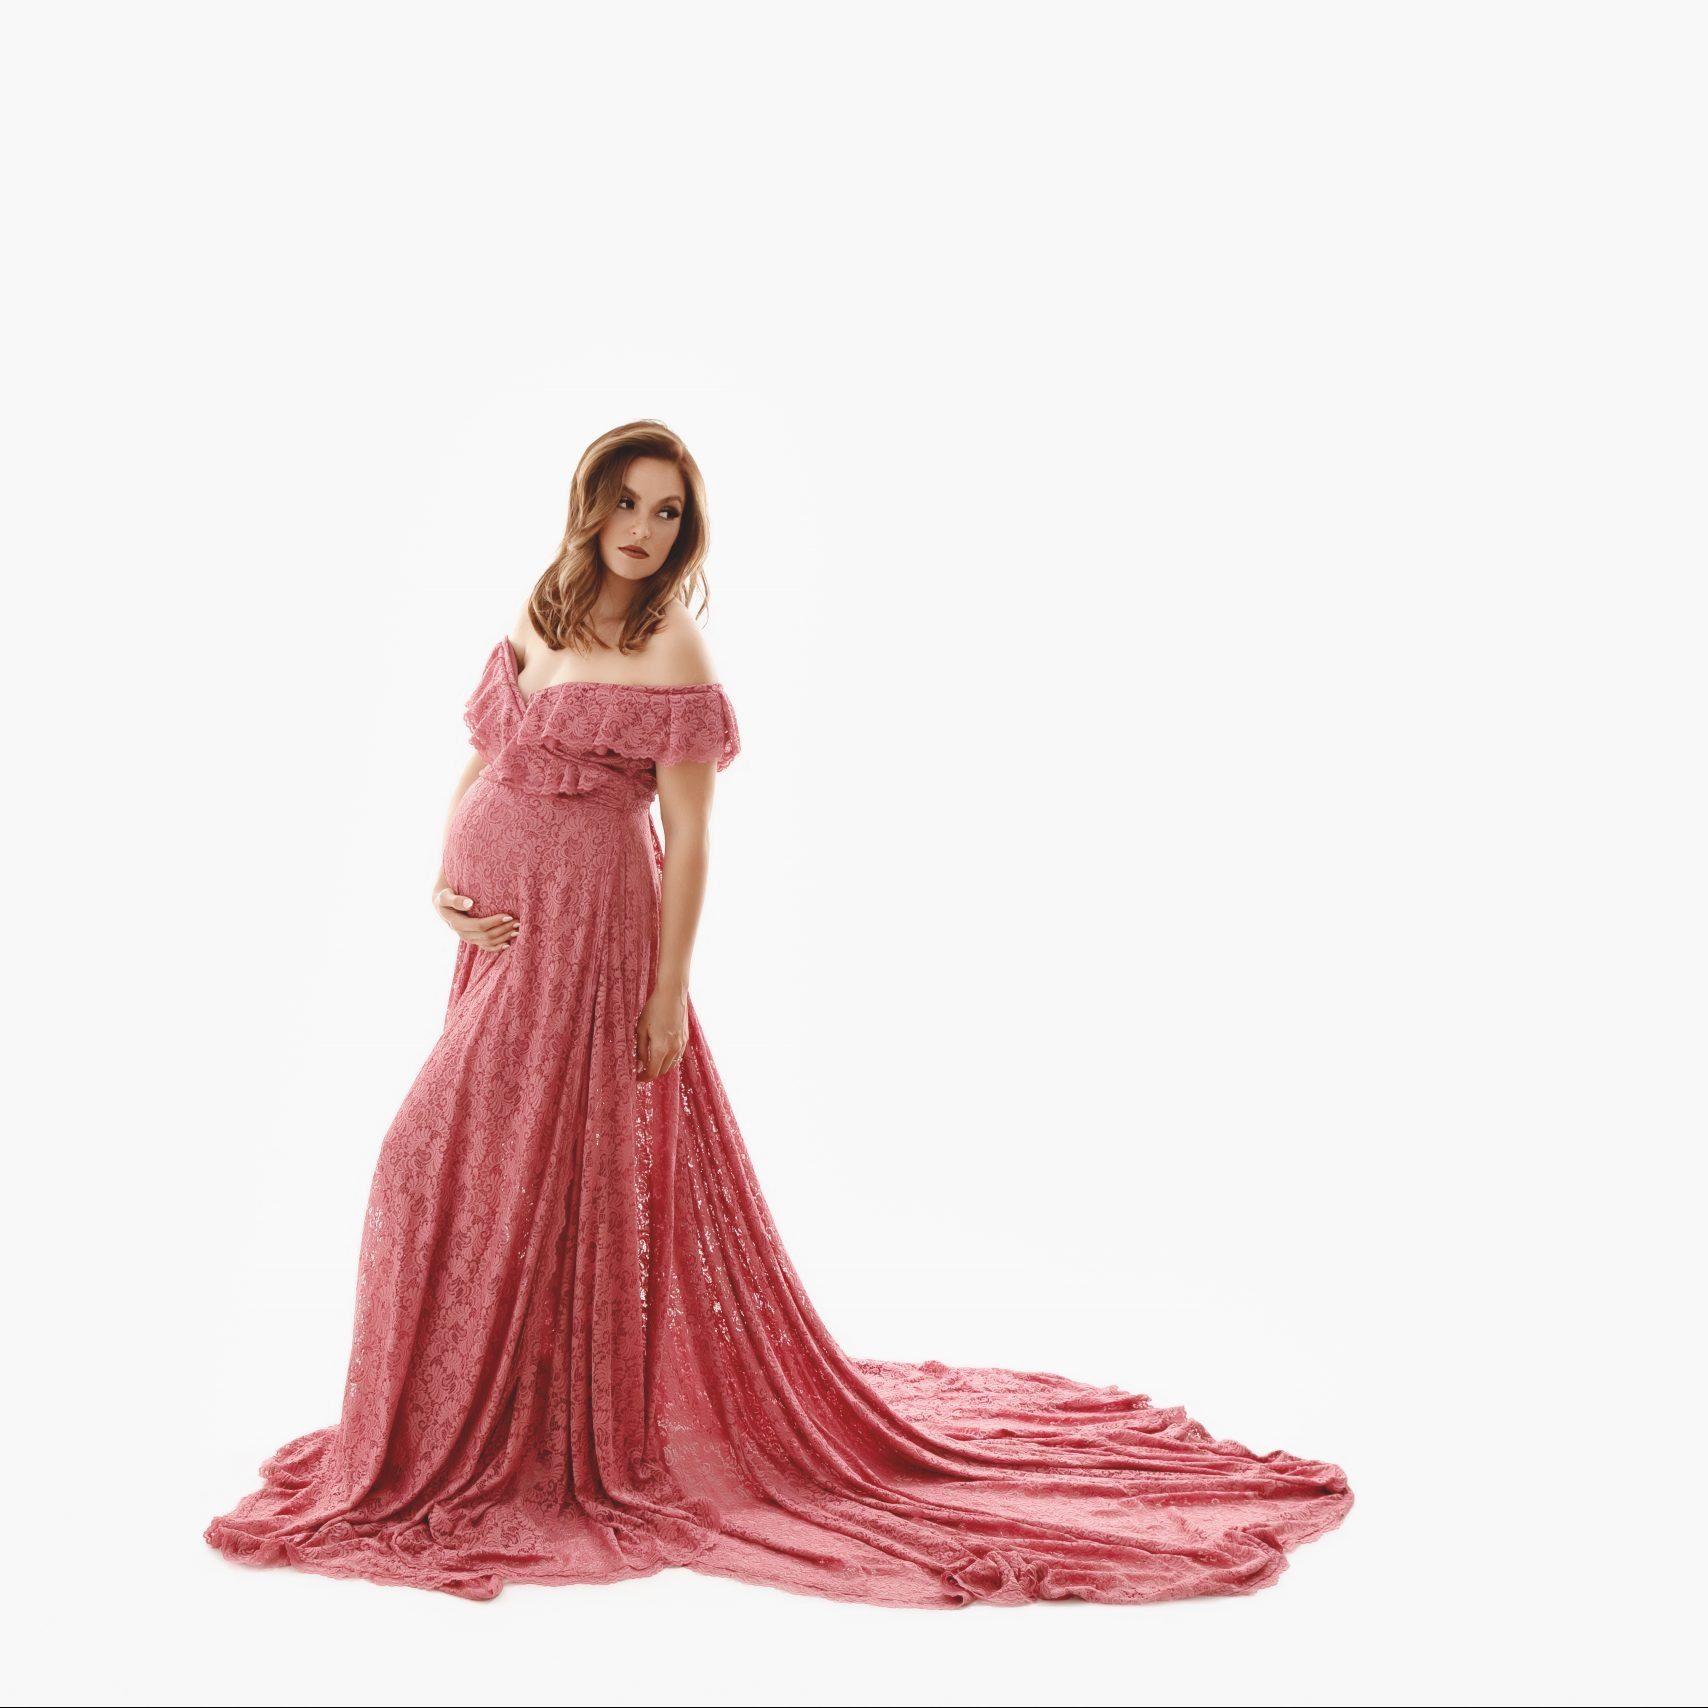 Antoinette Lace Maternity Gown, Miss Madison Boutique